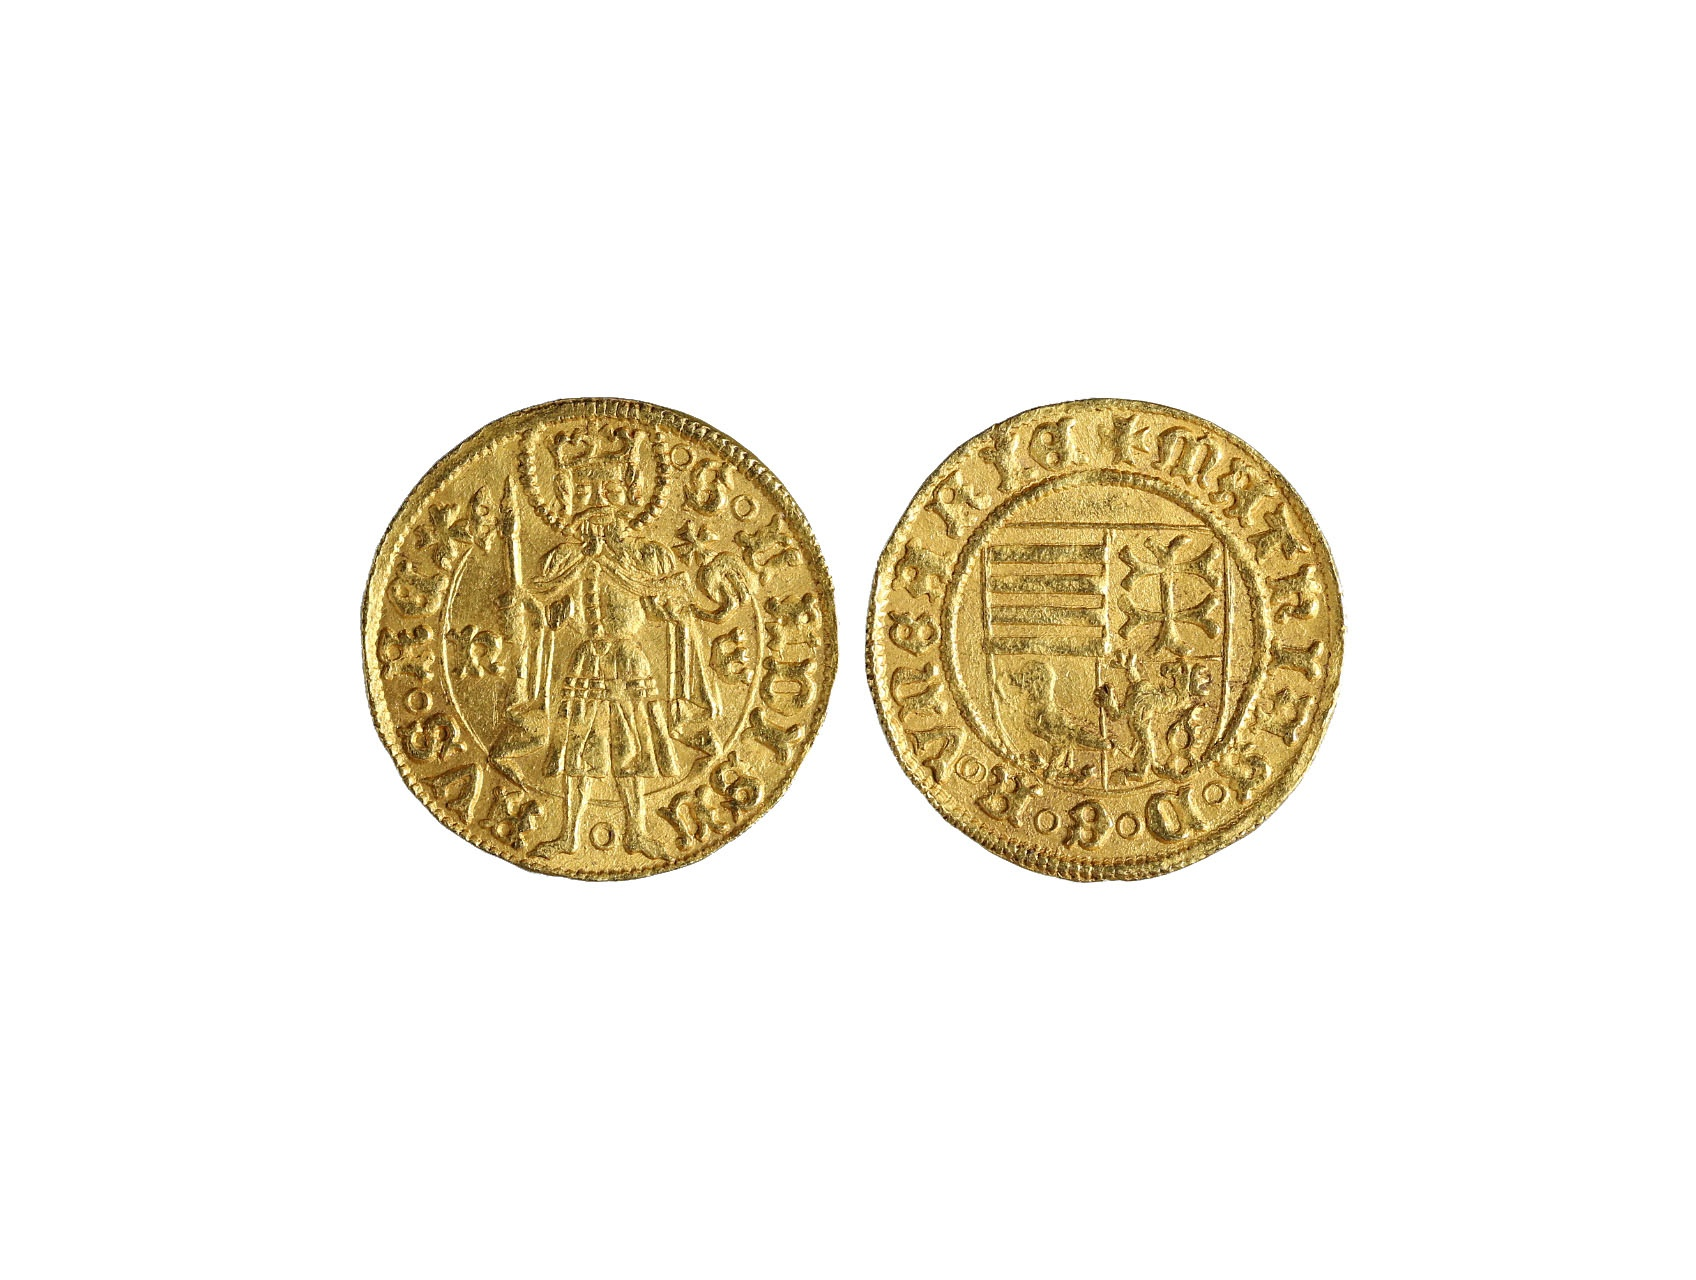 Matyáš Korvín 1458-1490 - Dukát b.l. (1458-66) N.E.mincovna Nagy Bánya, 3,6g, pohl K-1-15, var.a, Husz. 674